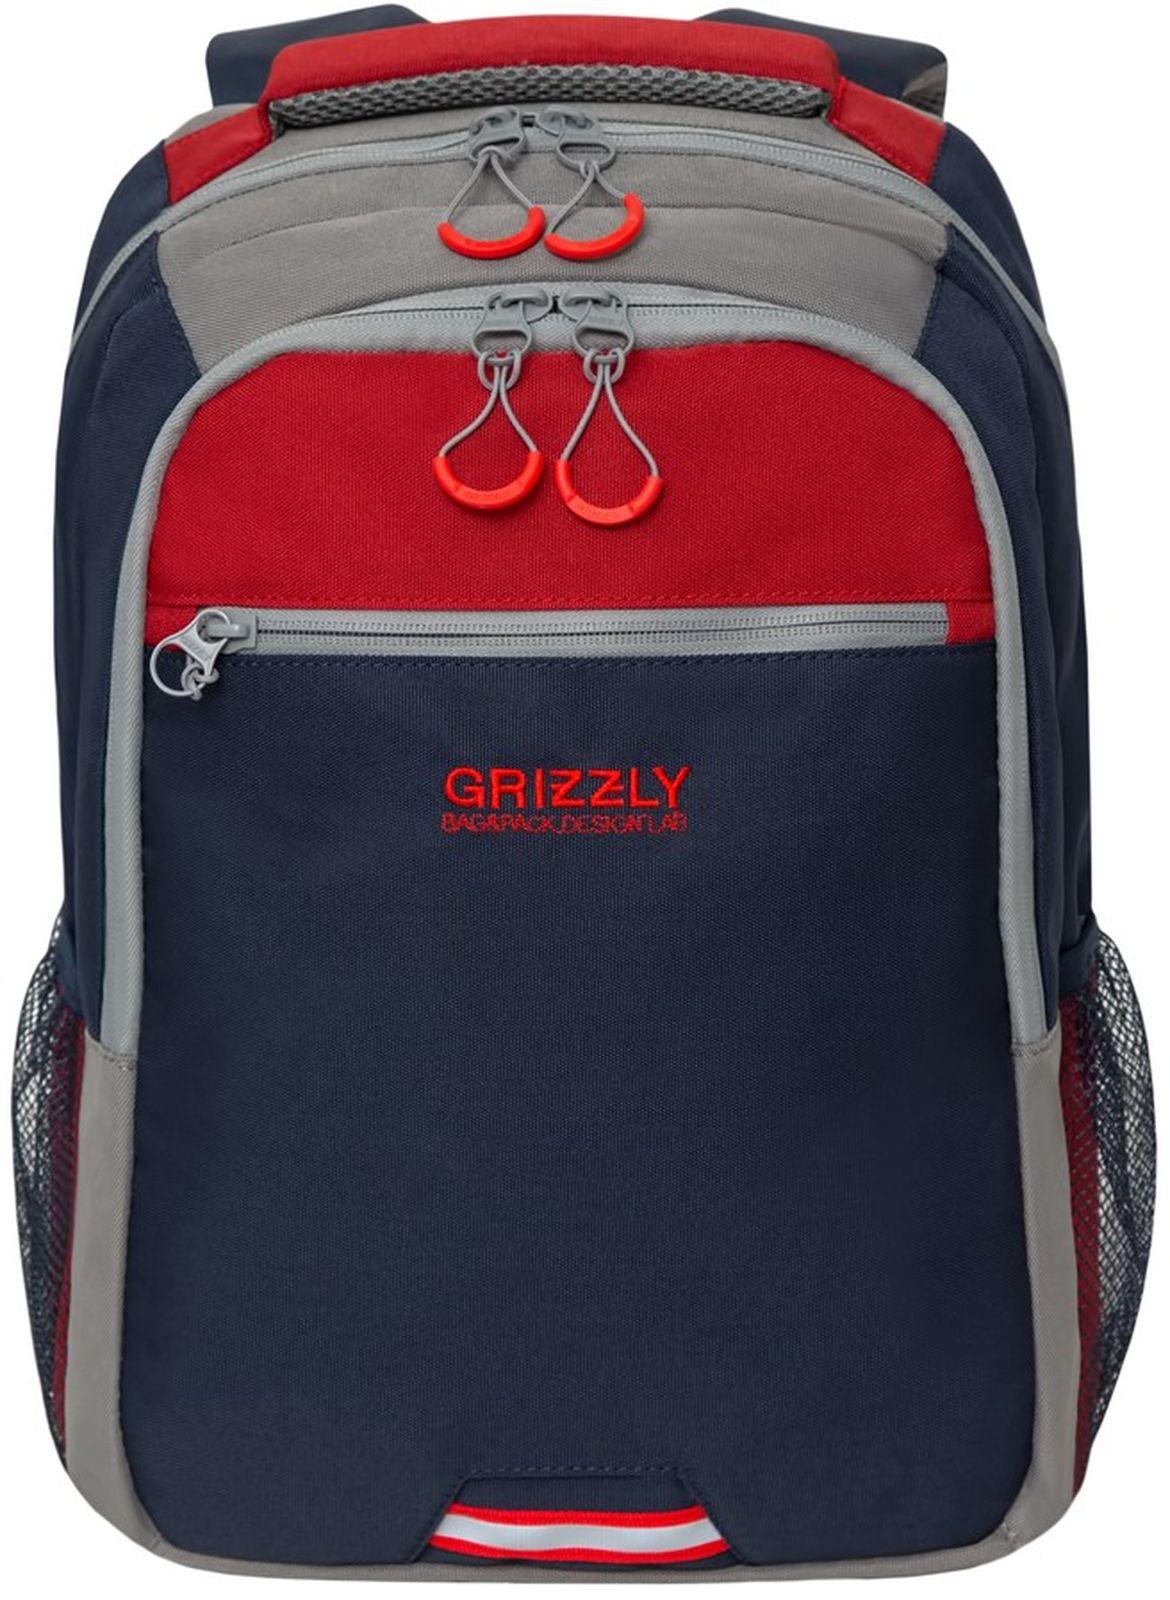 Рюкзак Grizzly, RU-922-3/2, красный, синий рюкзак grizzly ru 804 3 2 black lime green